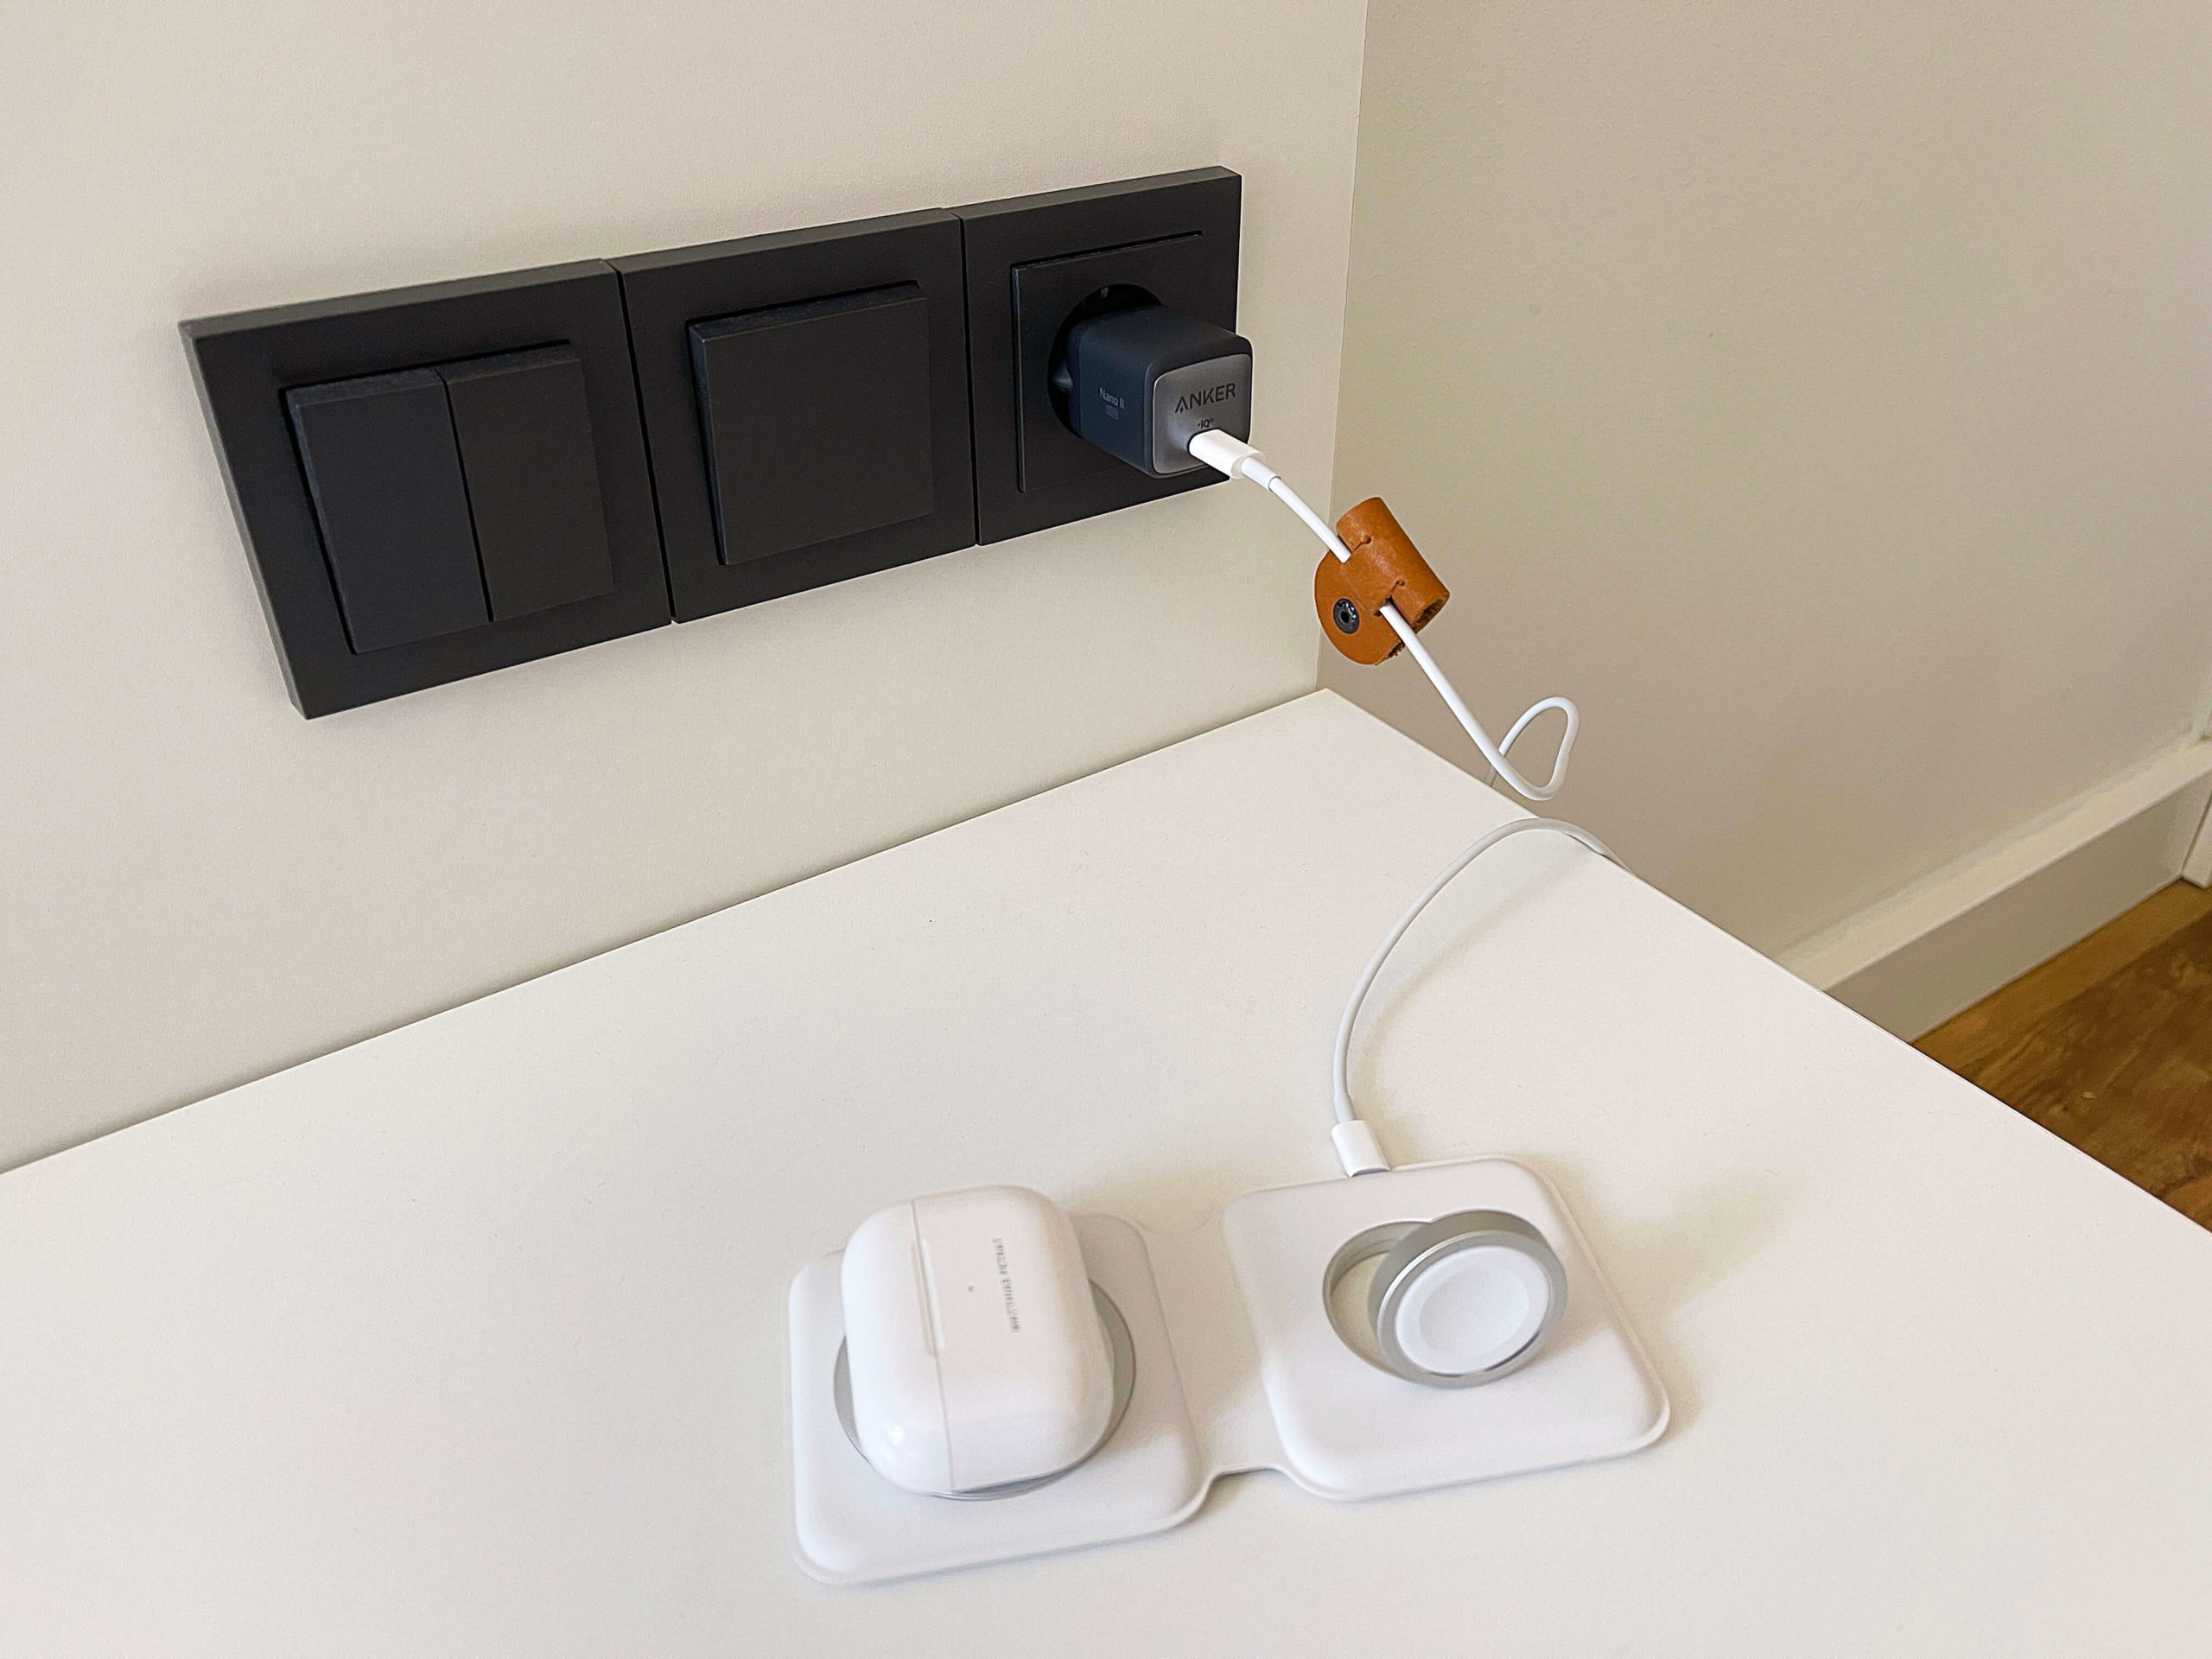 Anker-Nano-II-USB-C-Ladegeraet-von-Anker-30-Watt-im-Hosentaschenformat2-scaled Nano II USB-C-Ladegerät von Anker - 30 Watt im Hosentaschenformat